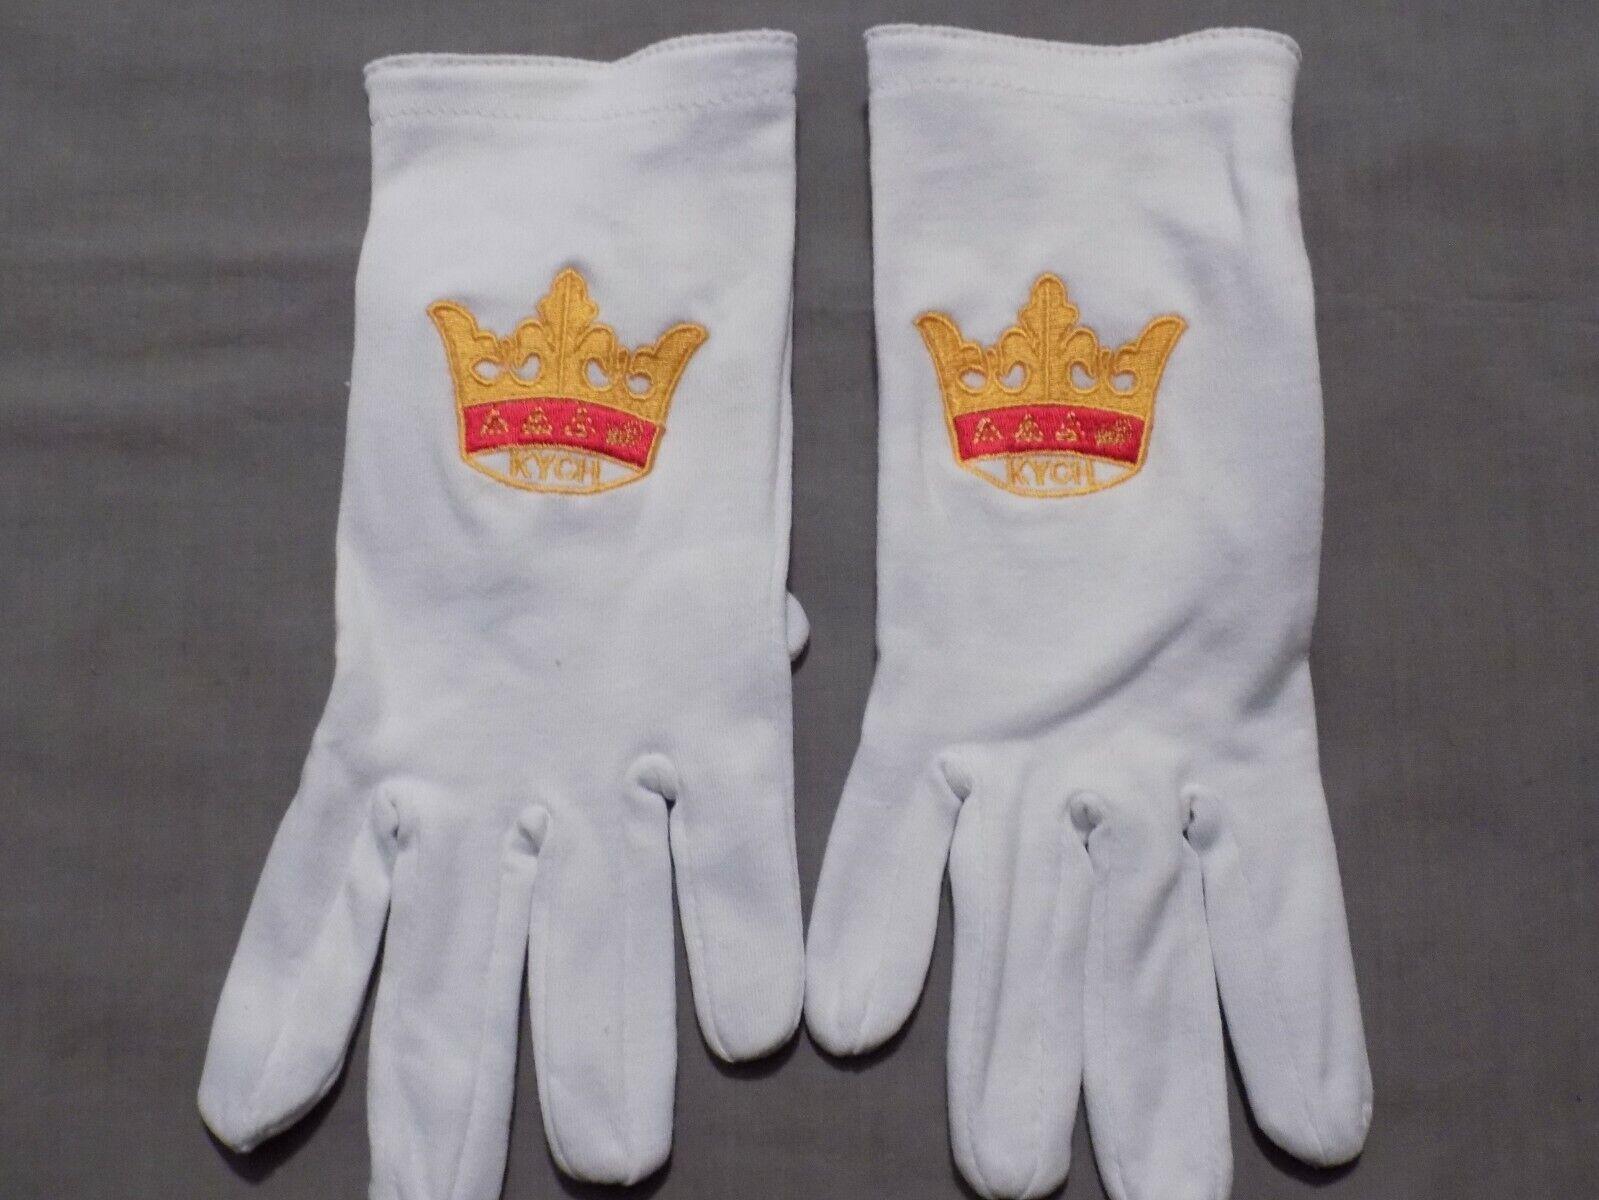 Freemason KYCH York Rites Embroidered White Cotton Gloves Ceremonial Logo NEW!